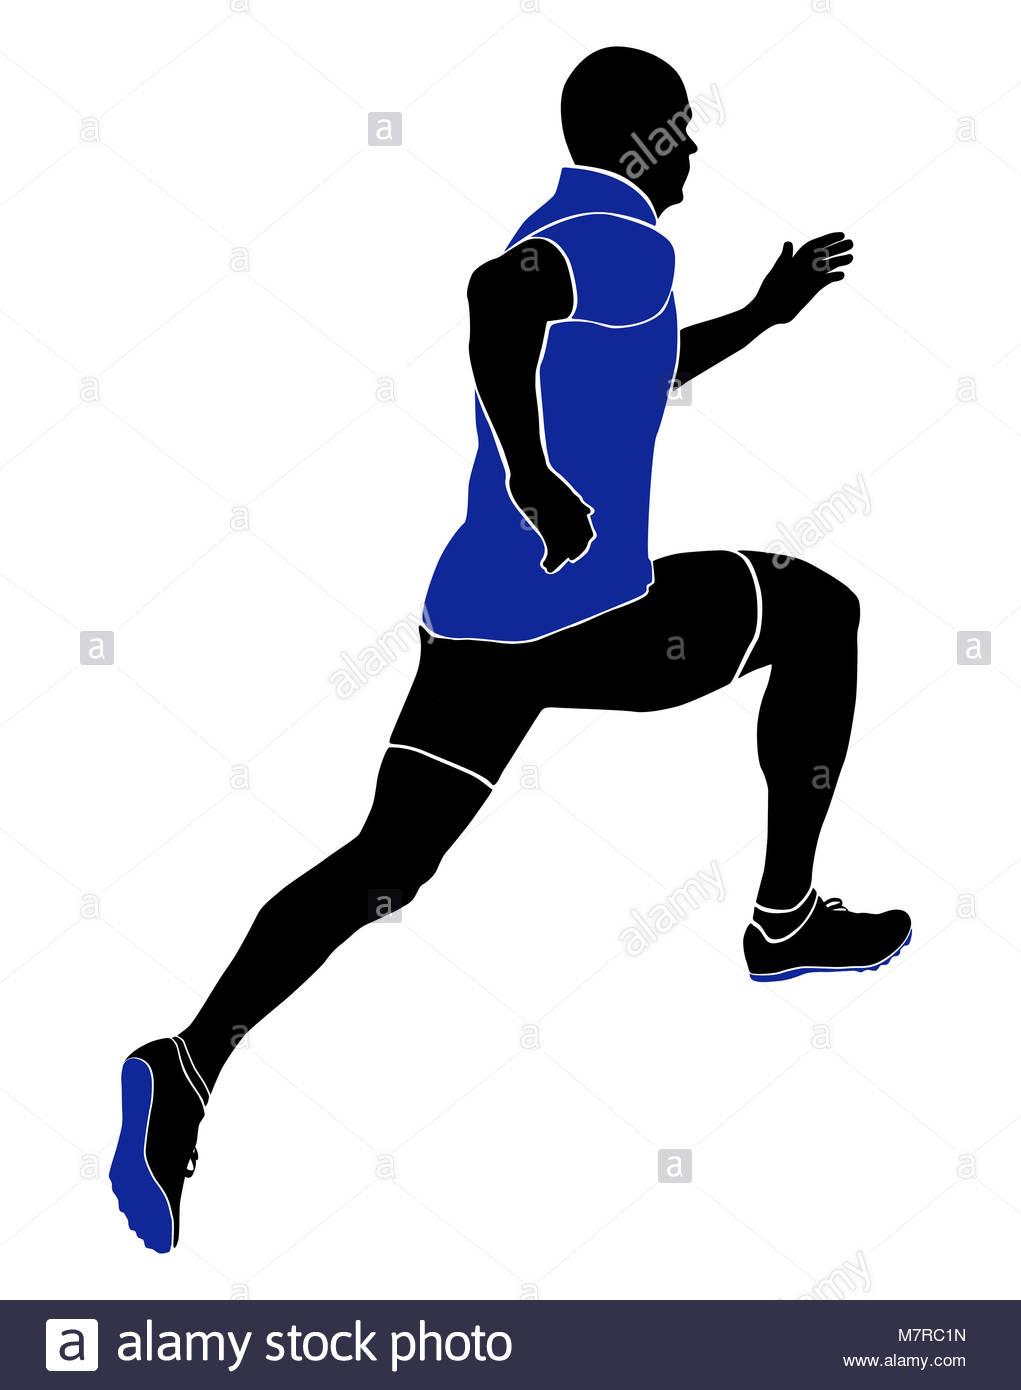 1021x1390 Sprinter Silhouette Runner Start Stock Photos Amp Sprinter